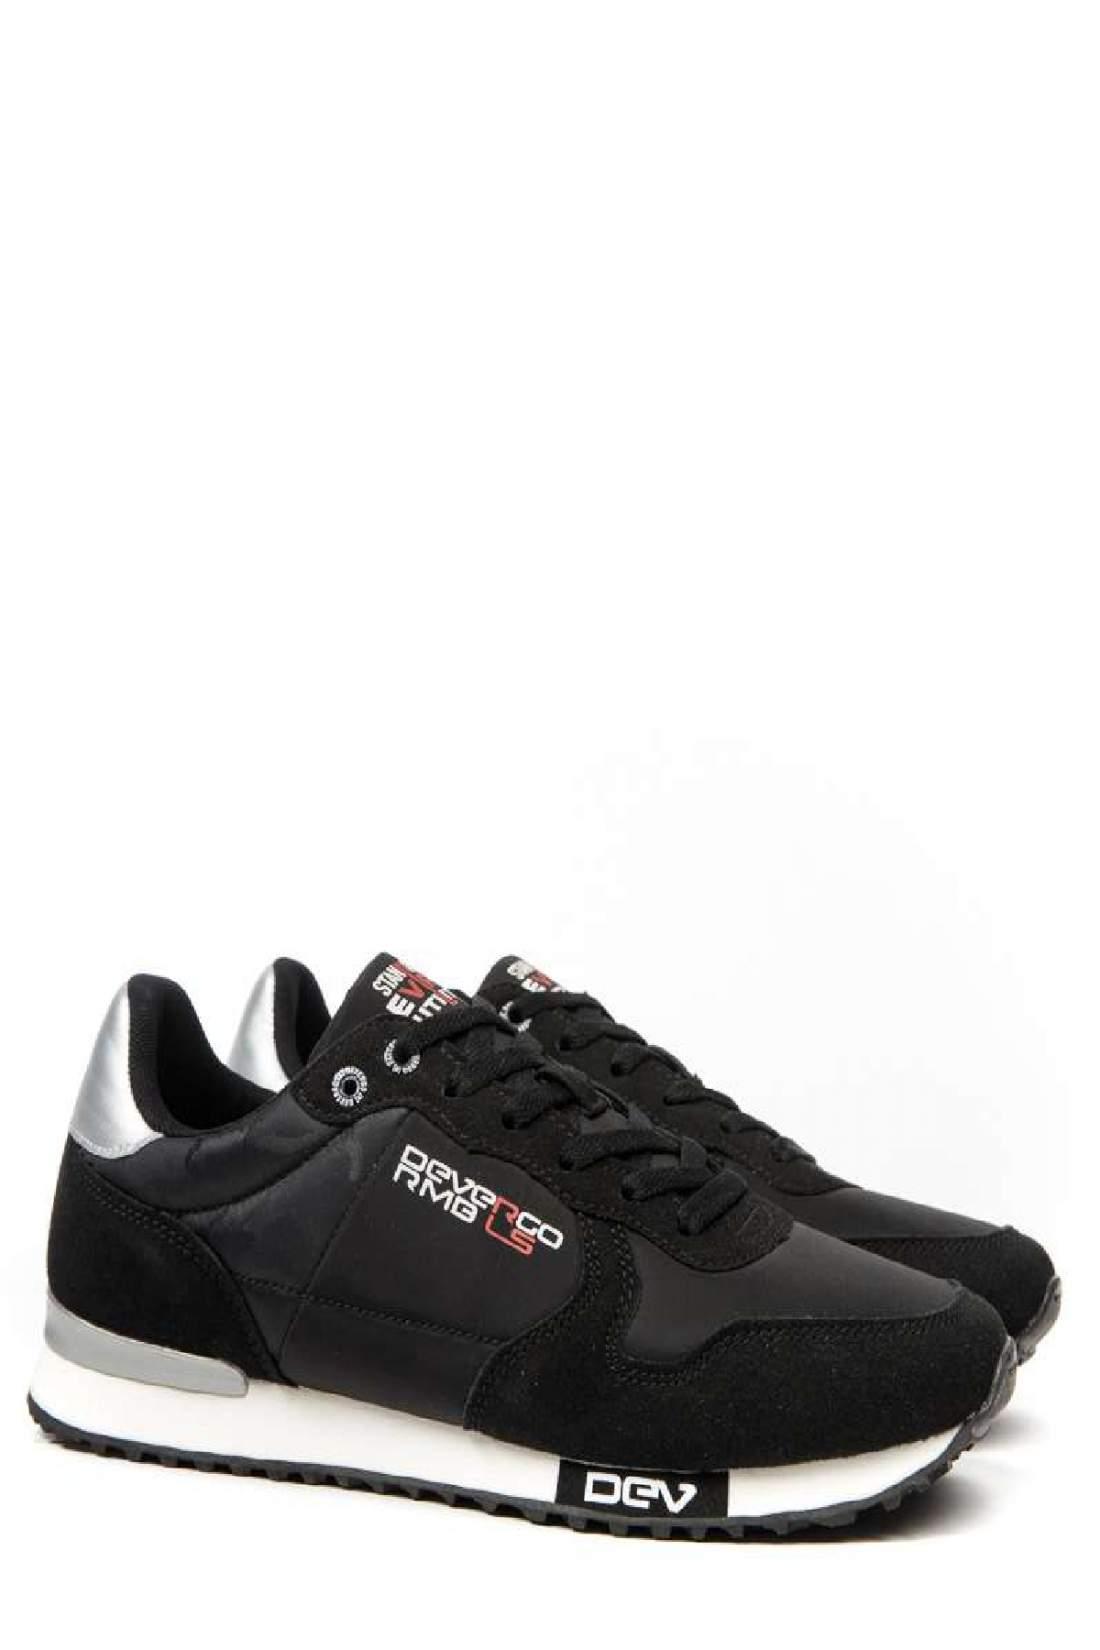 Devergo TYRON férfi sportcipő - Fekete